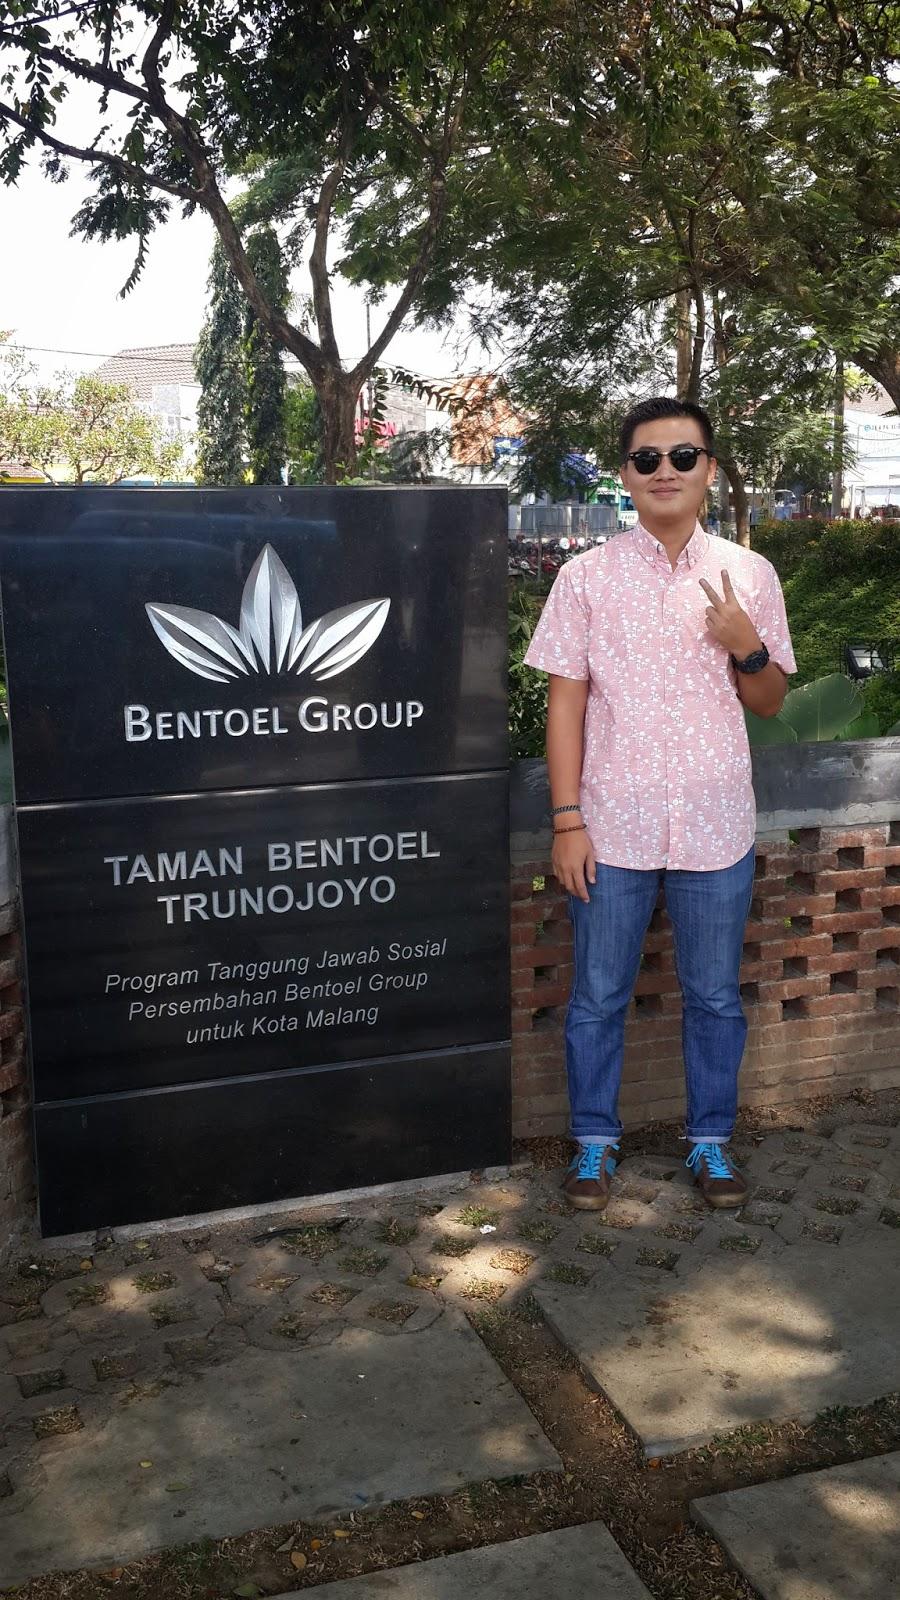 Wardhanaivan25 Taman Bentoel Trunojoyo Malang Cerdas Kota